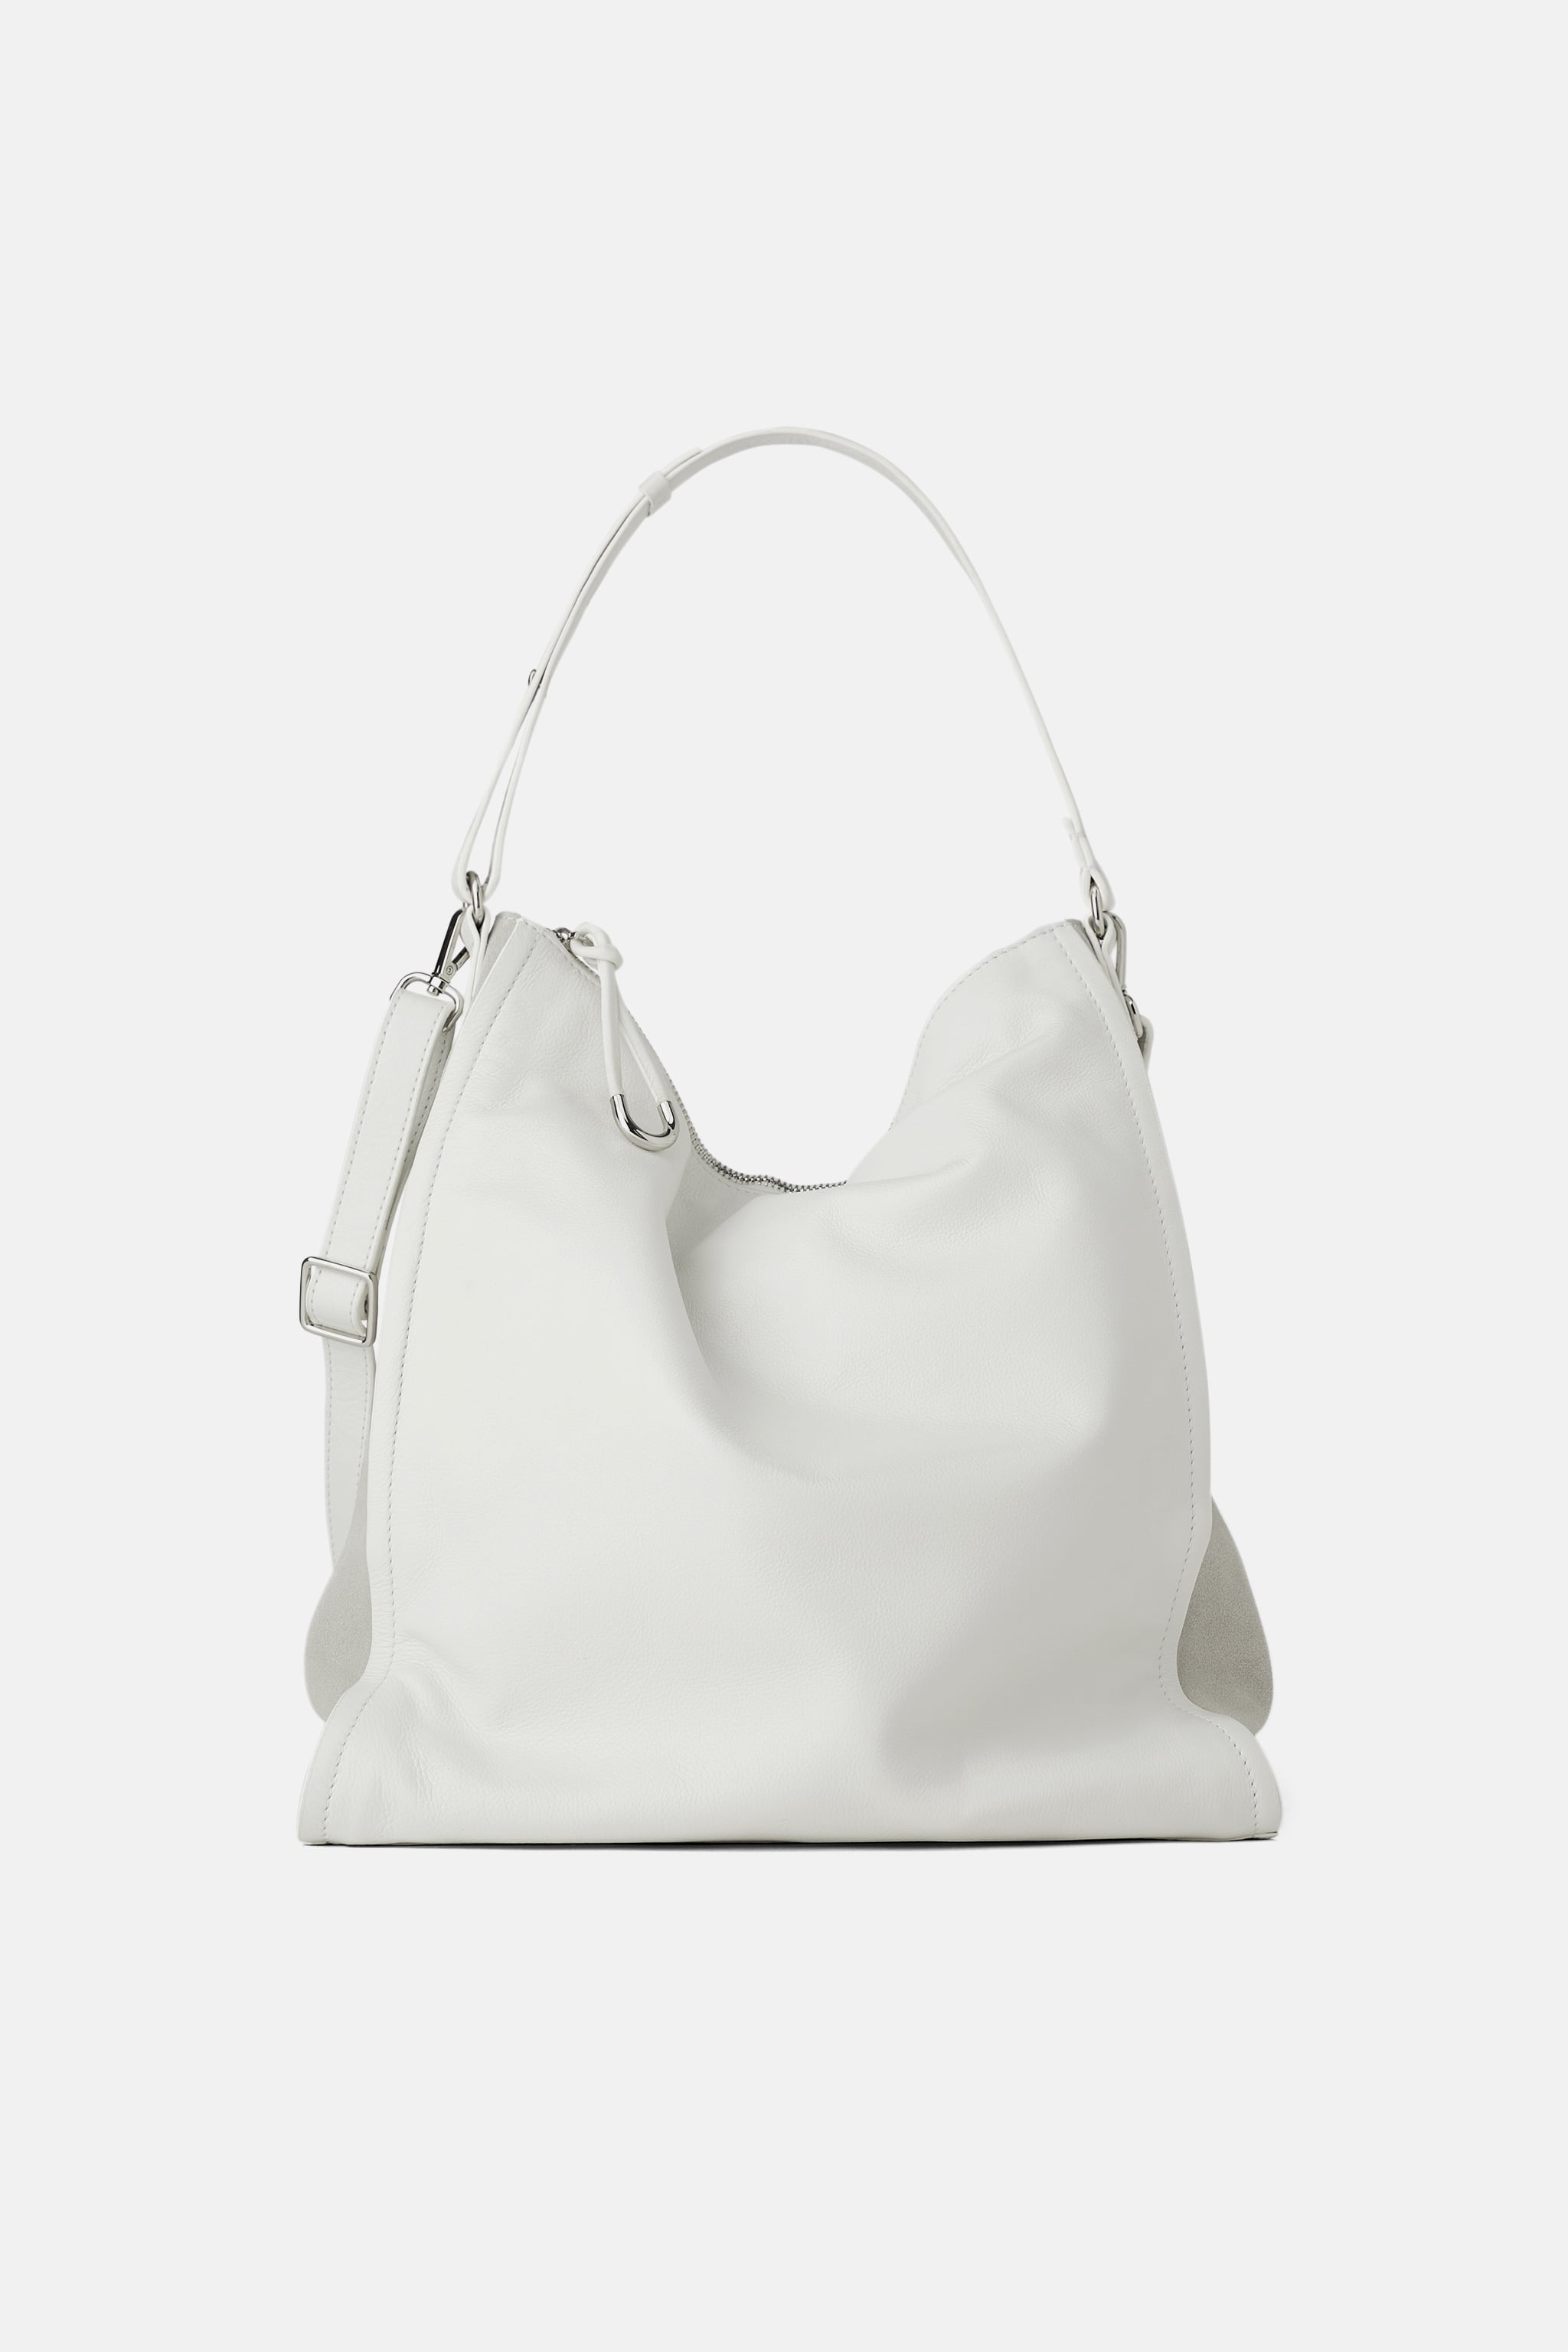 5675f4753d57 Zara TUMBLED SOFT LEATHER BUCKET BAG